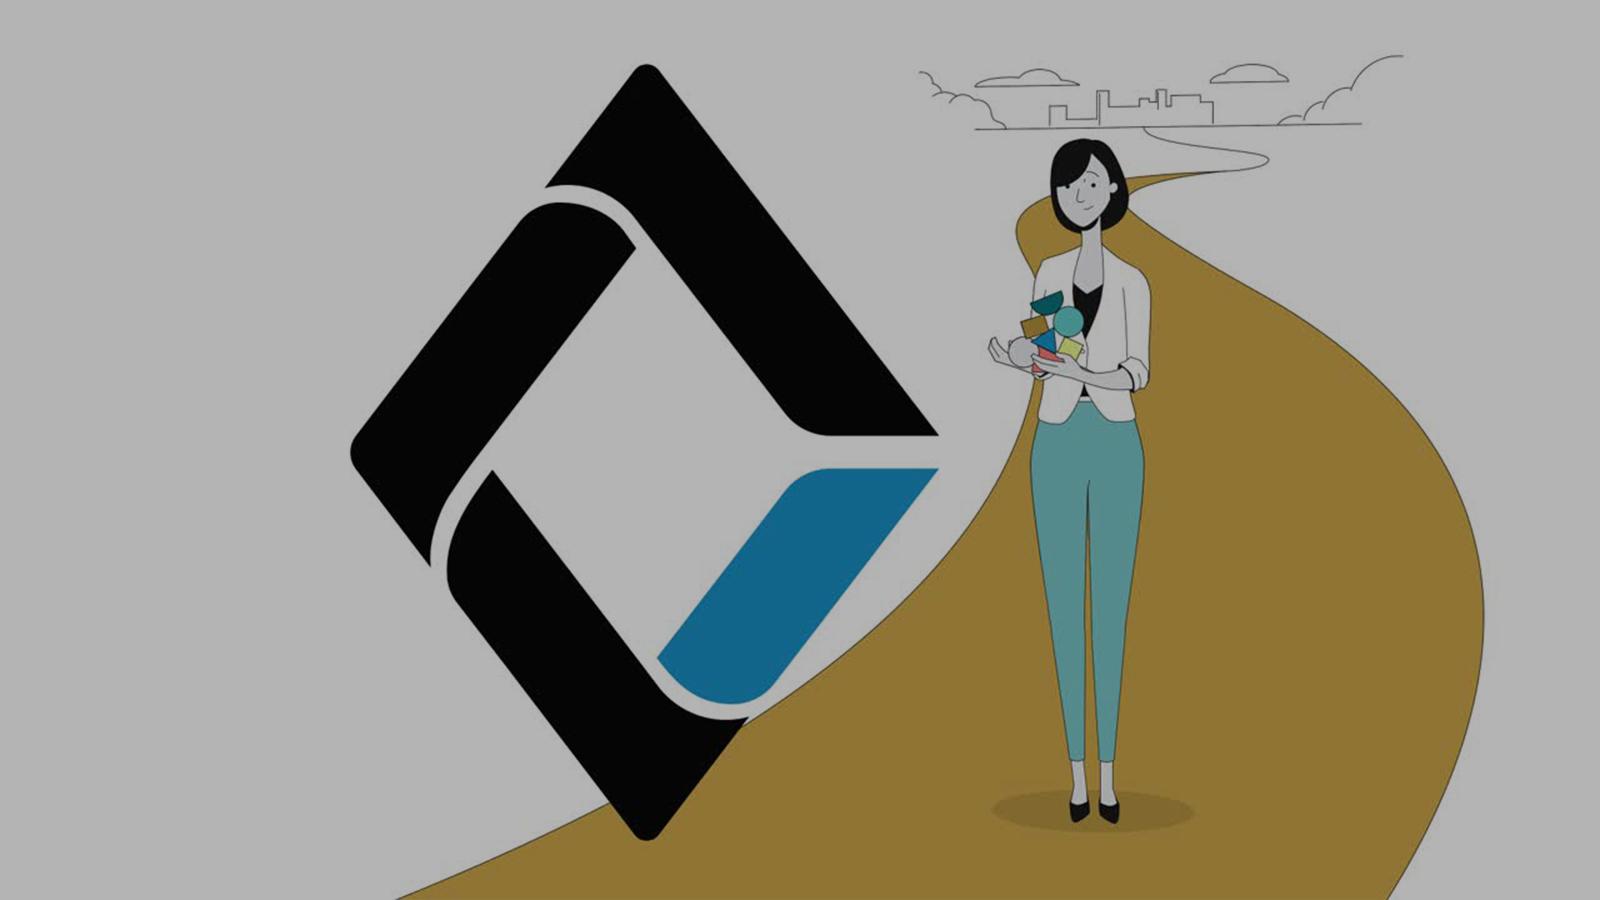 poster image for <p>Black Diamond: Client View Application</p>